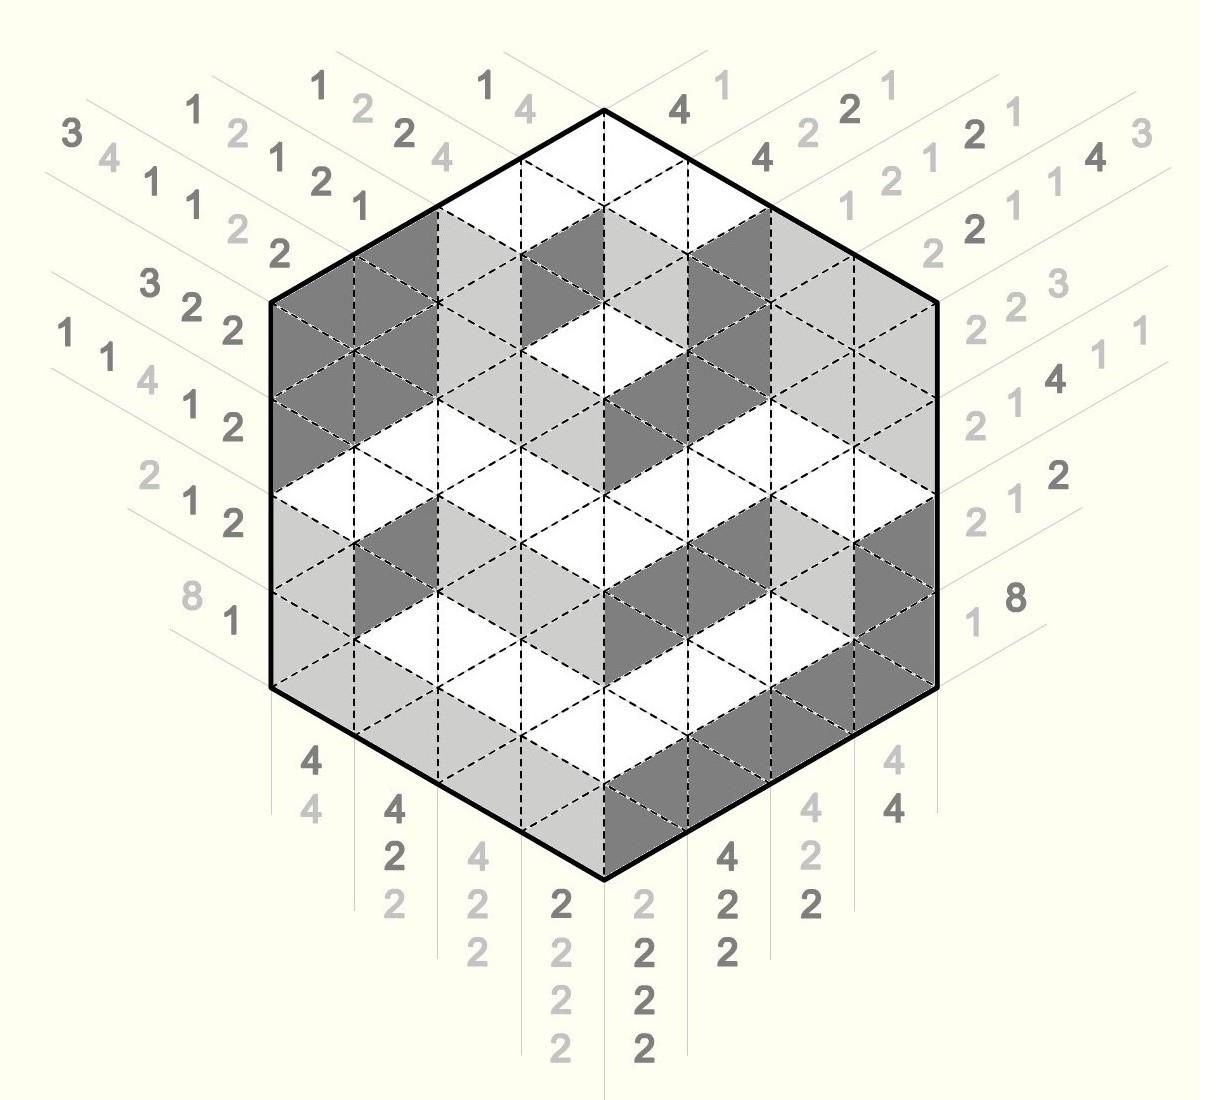 http://www.prise2tete.fr/upload/Flying_pyros-Friz-Fr3dom.jpg